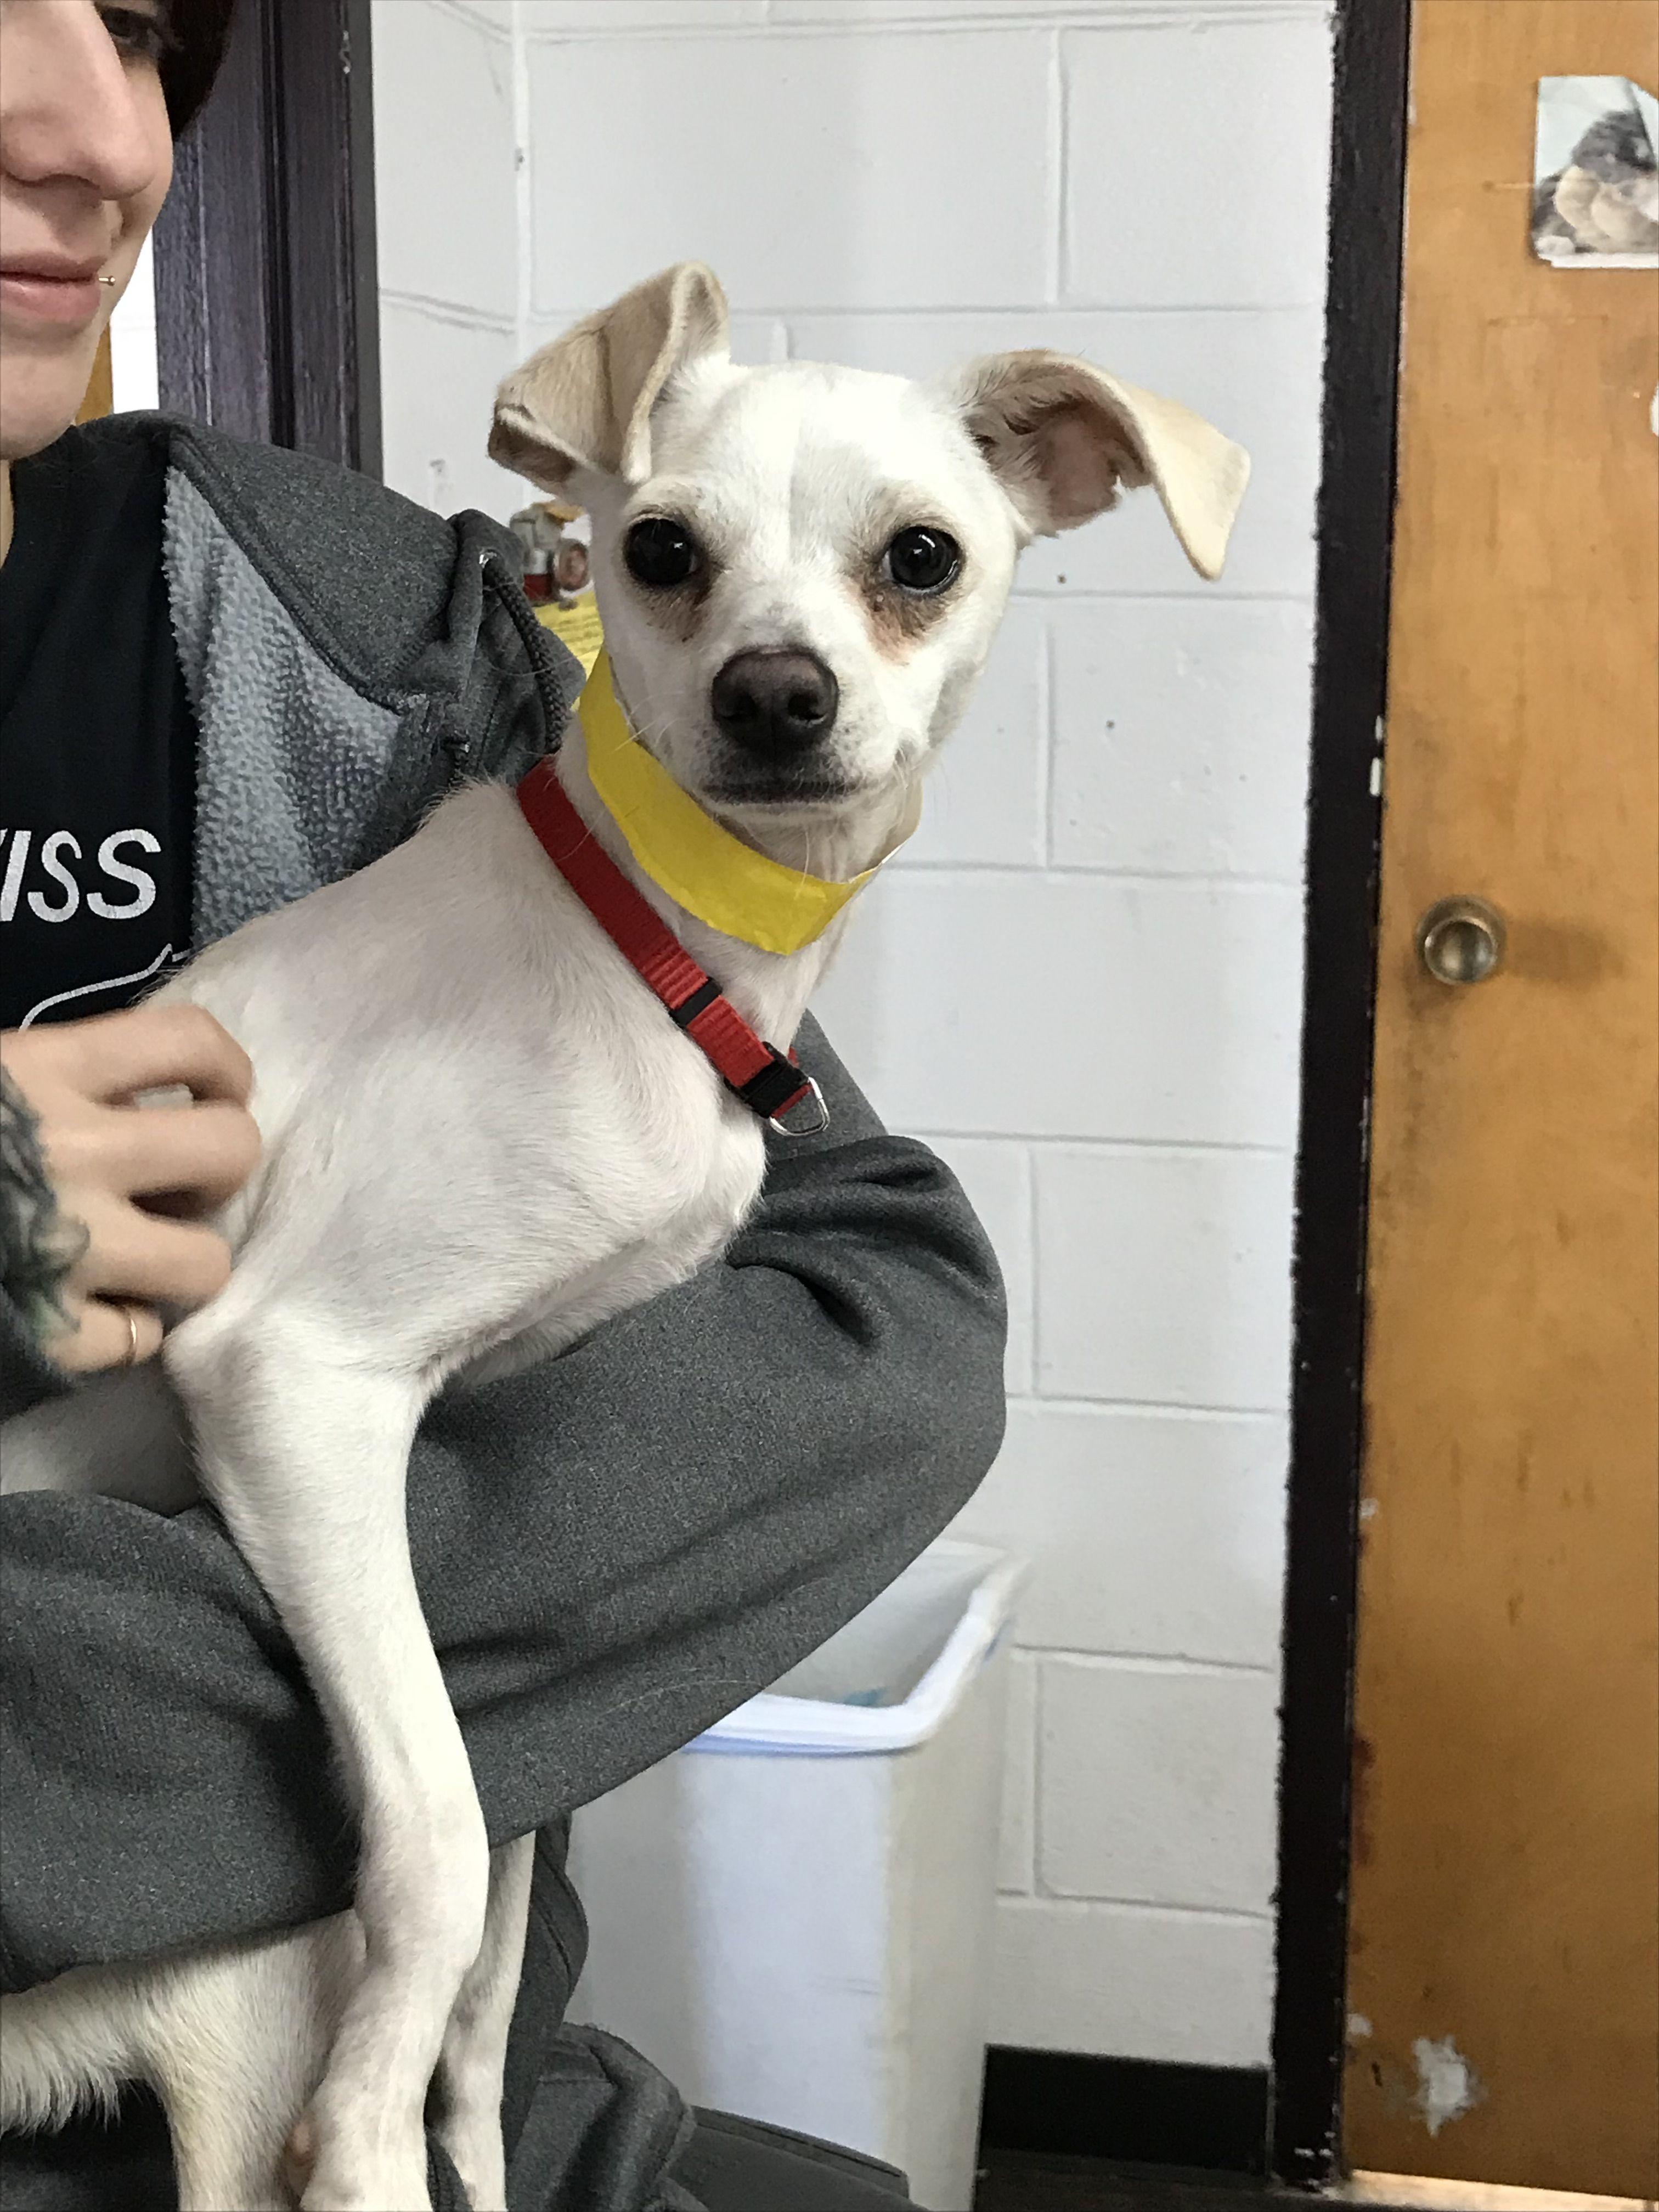 Italian Greyhuahua dog for Adoption in Hudson, CO. ADN